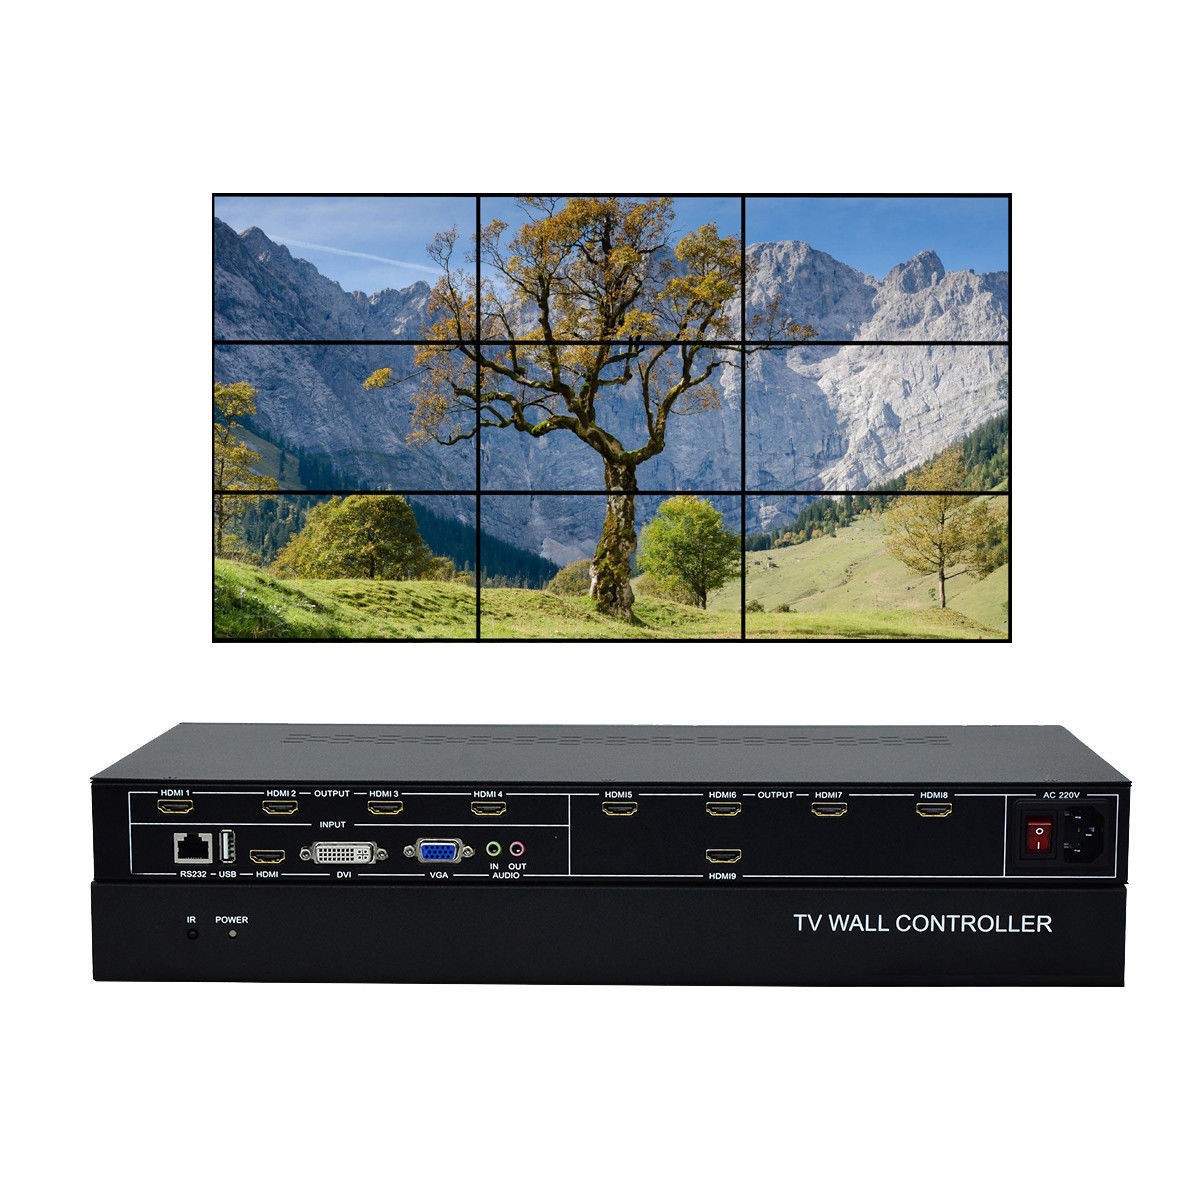 купить ESZYM 9 Channel TV Video Wall Controller 3x3 2x4 4x2 HDMI DVI VGA USB Video Processor по цене 63305.67 рублей